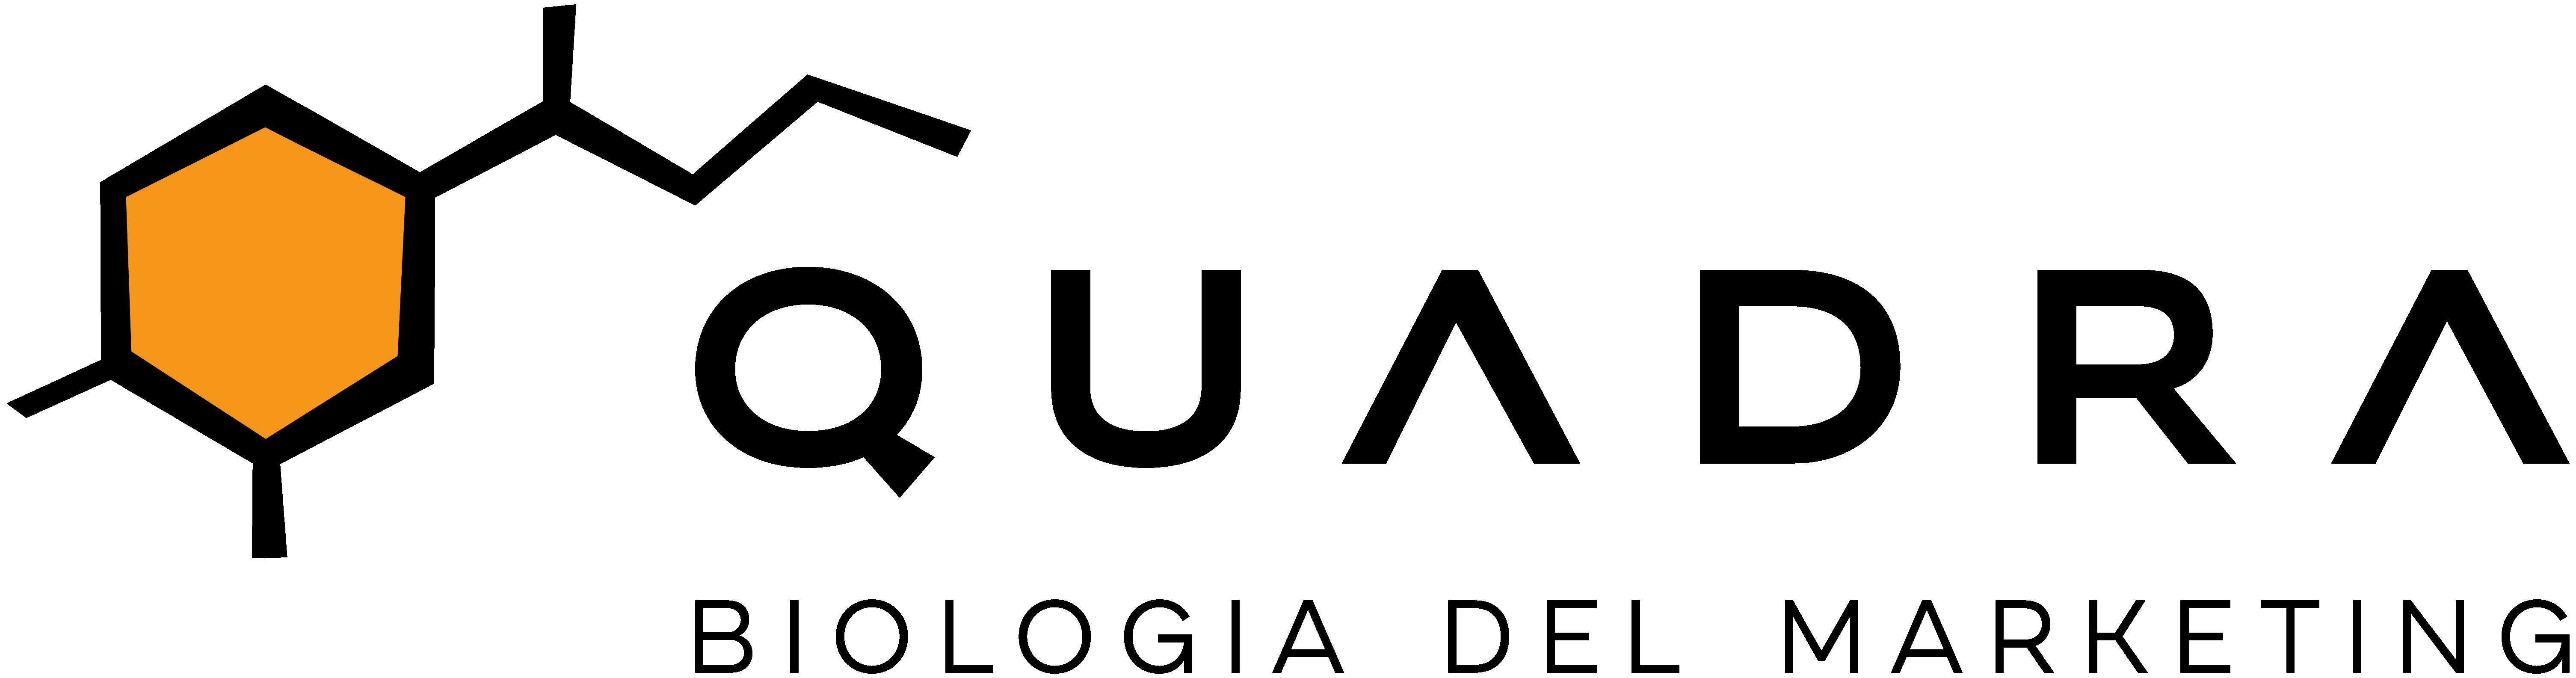 logo quadra orizzontale_Tavola disegno 1